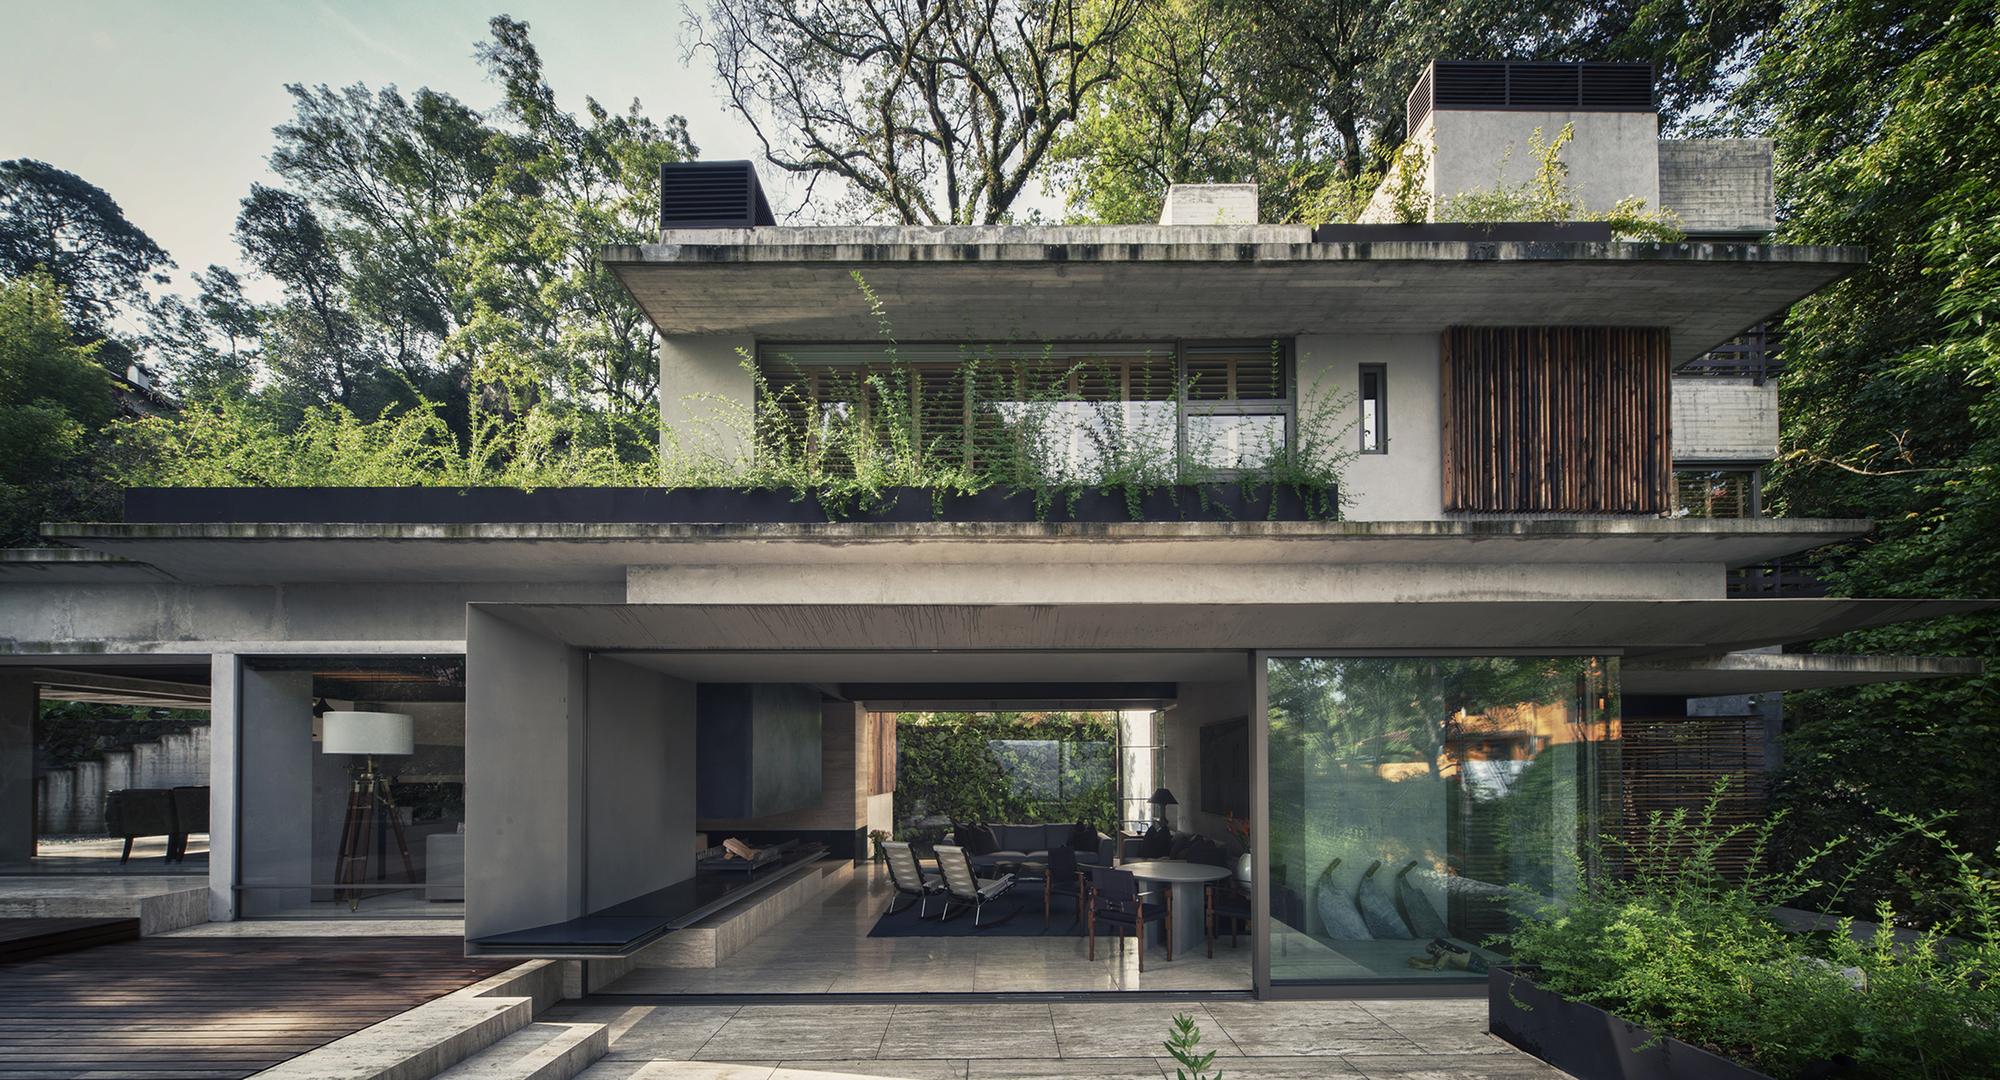 530eb88fc07a80ed3b000159_house-maza-chk-arquitectura_portada_2014_02_18_mz_fotos_yoshihiro_2280px_ancho_-3-